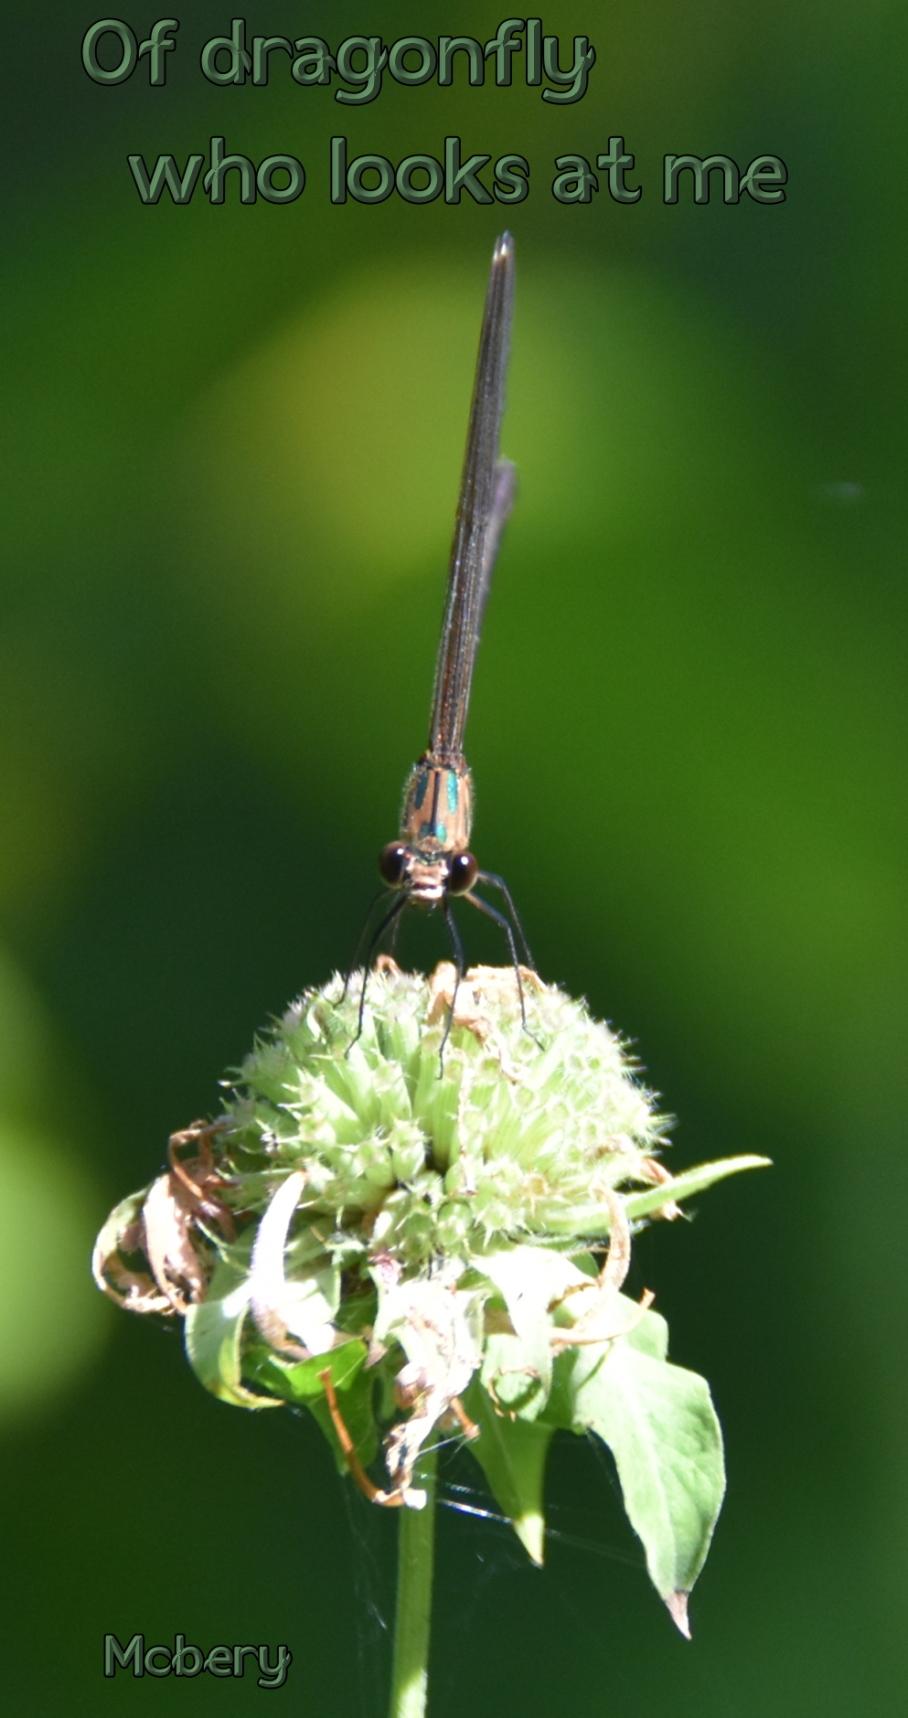 5 wellfield 1 dragonfly e